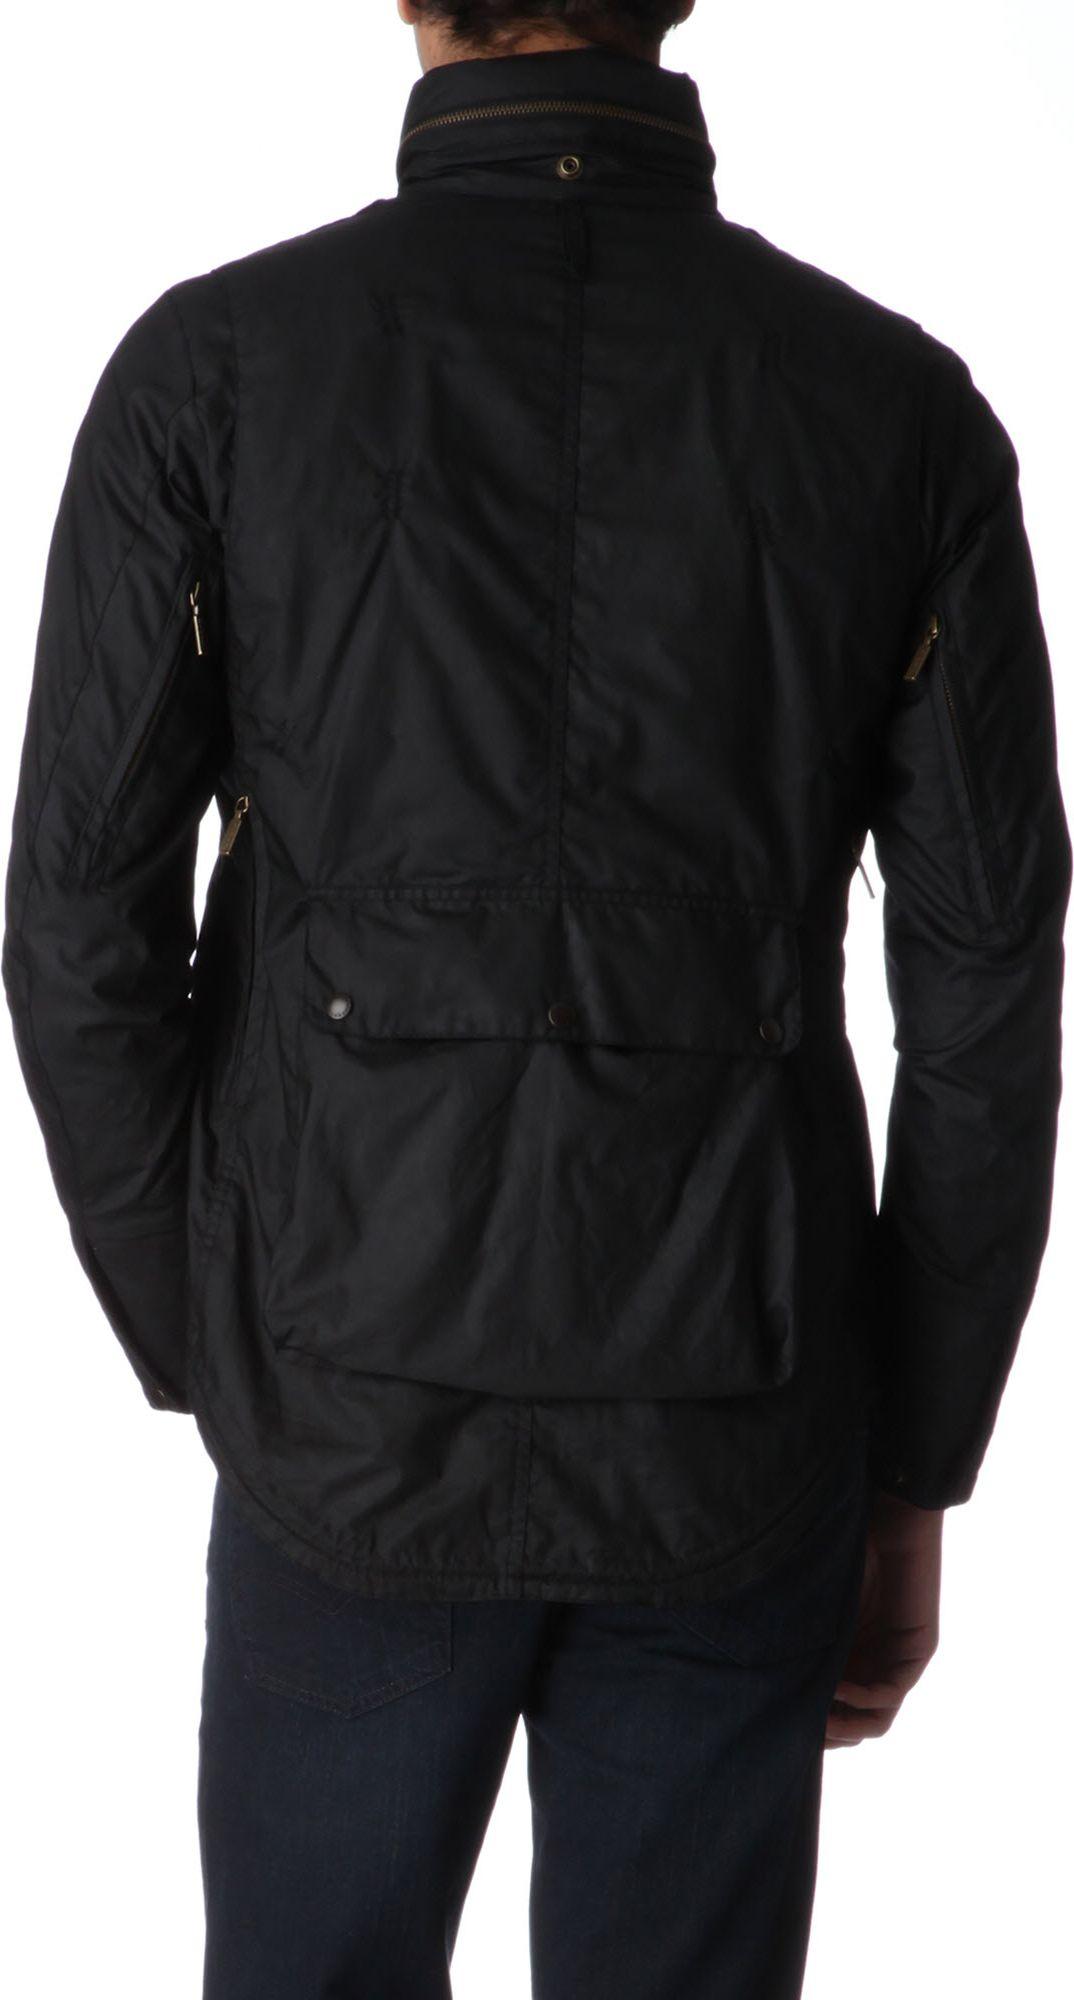 Barbour Lightweight Motorcycle Jacket In Black For Men Lyst